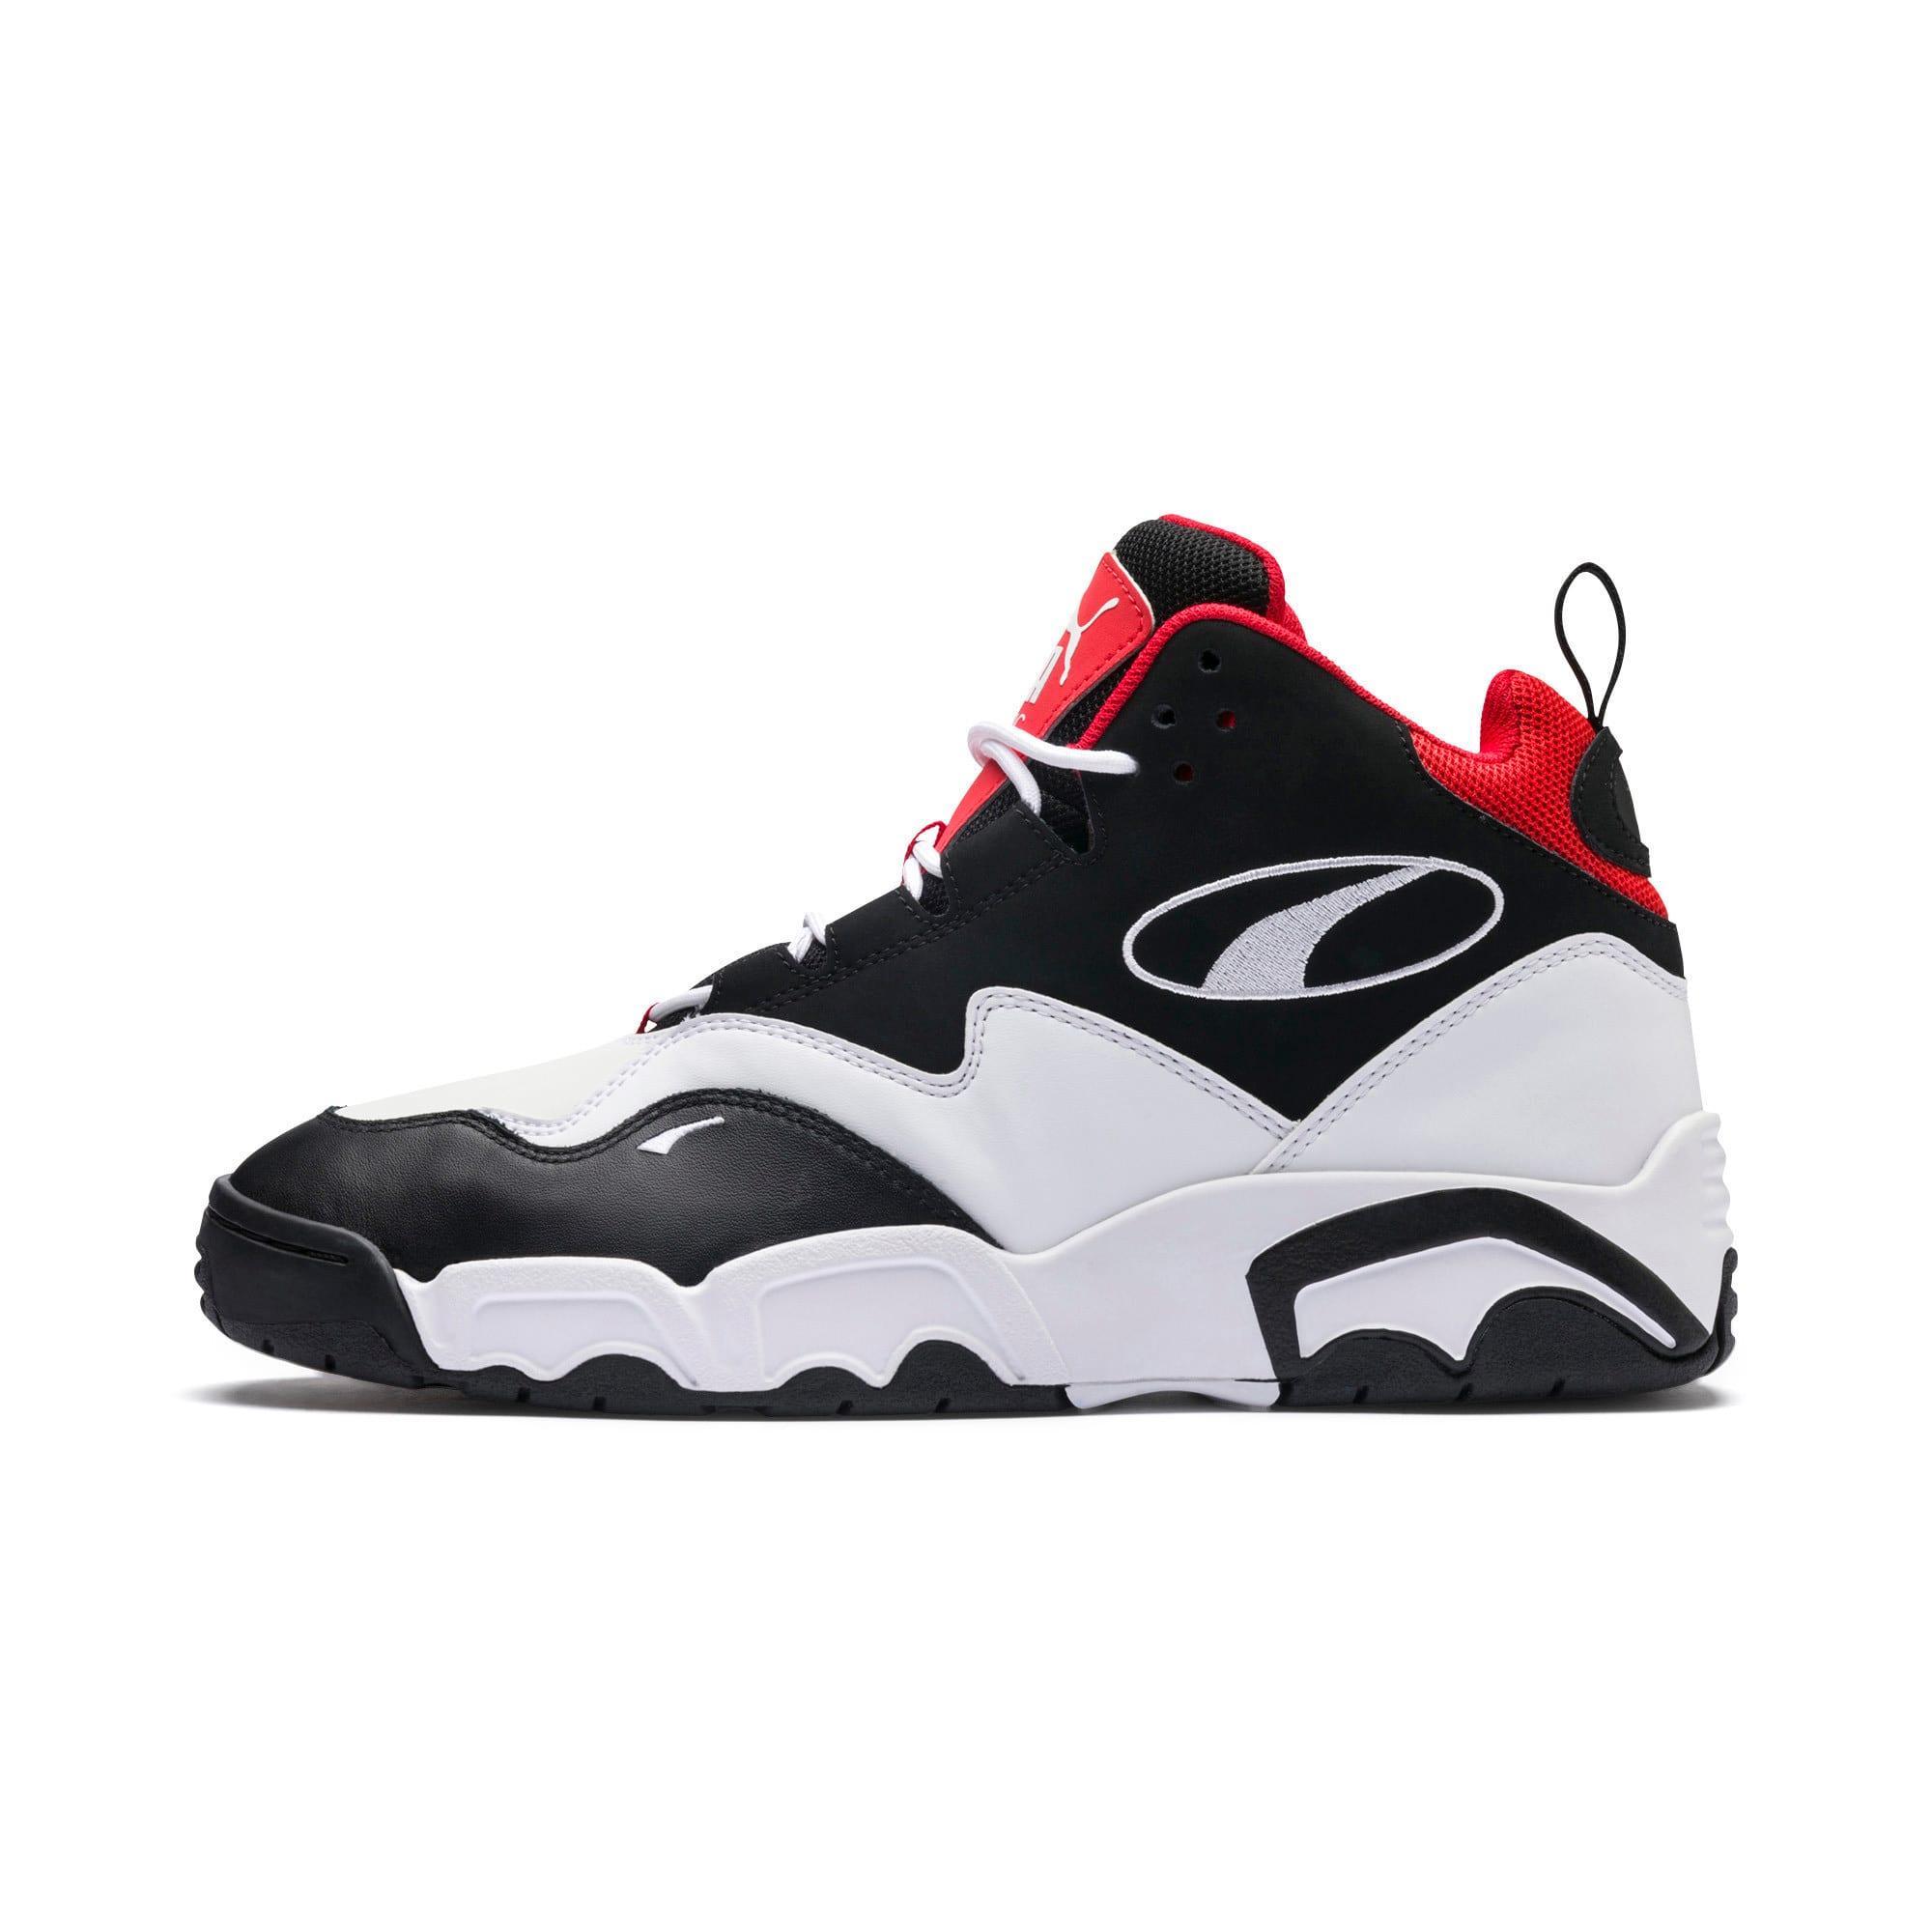 Miniatura 1 de Zapatos deportivos Source de caña media, Black- White-High Risk Red, mediano